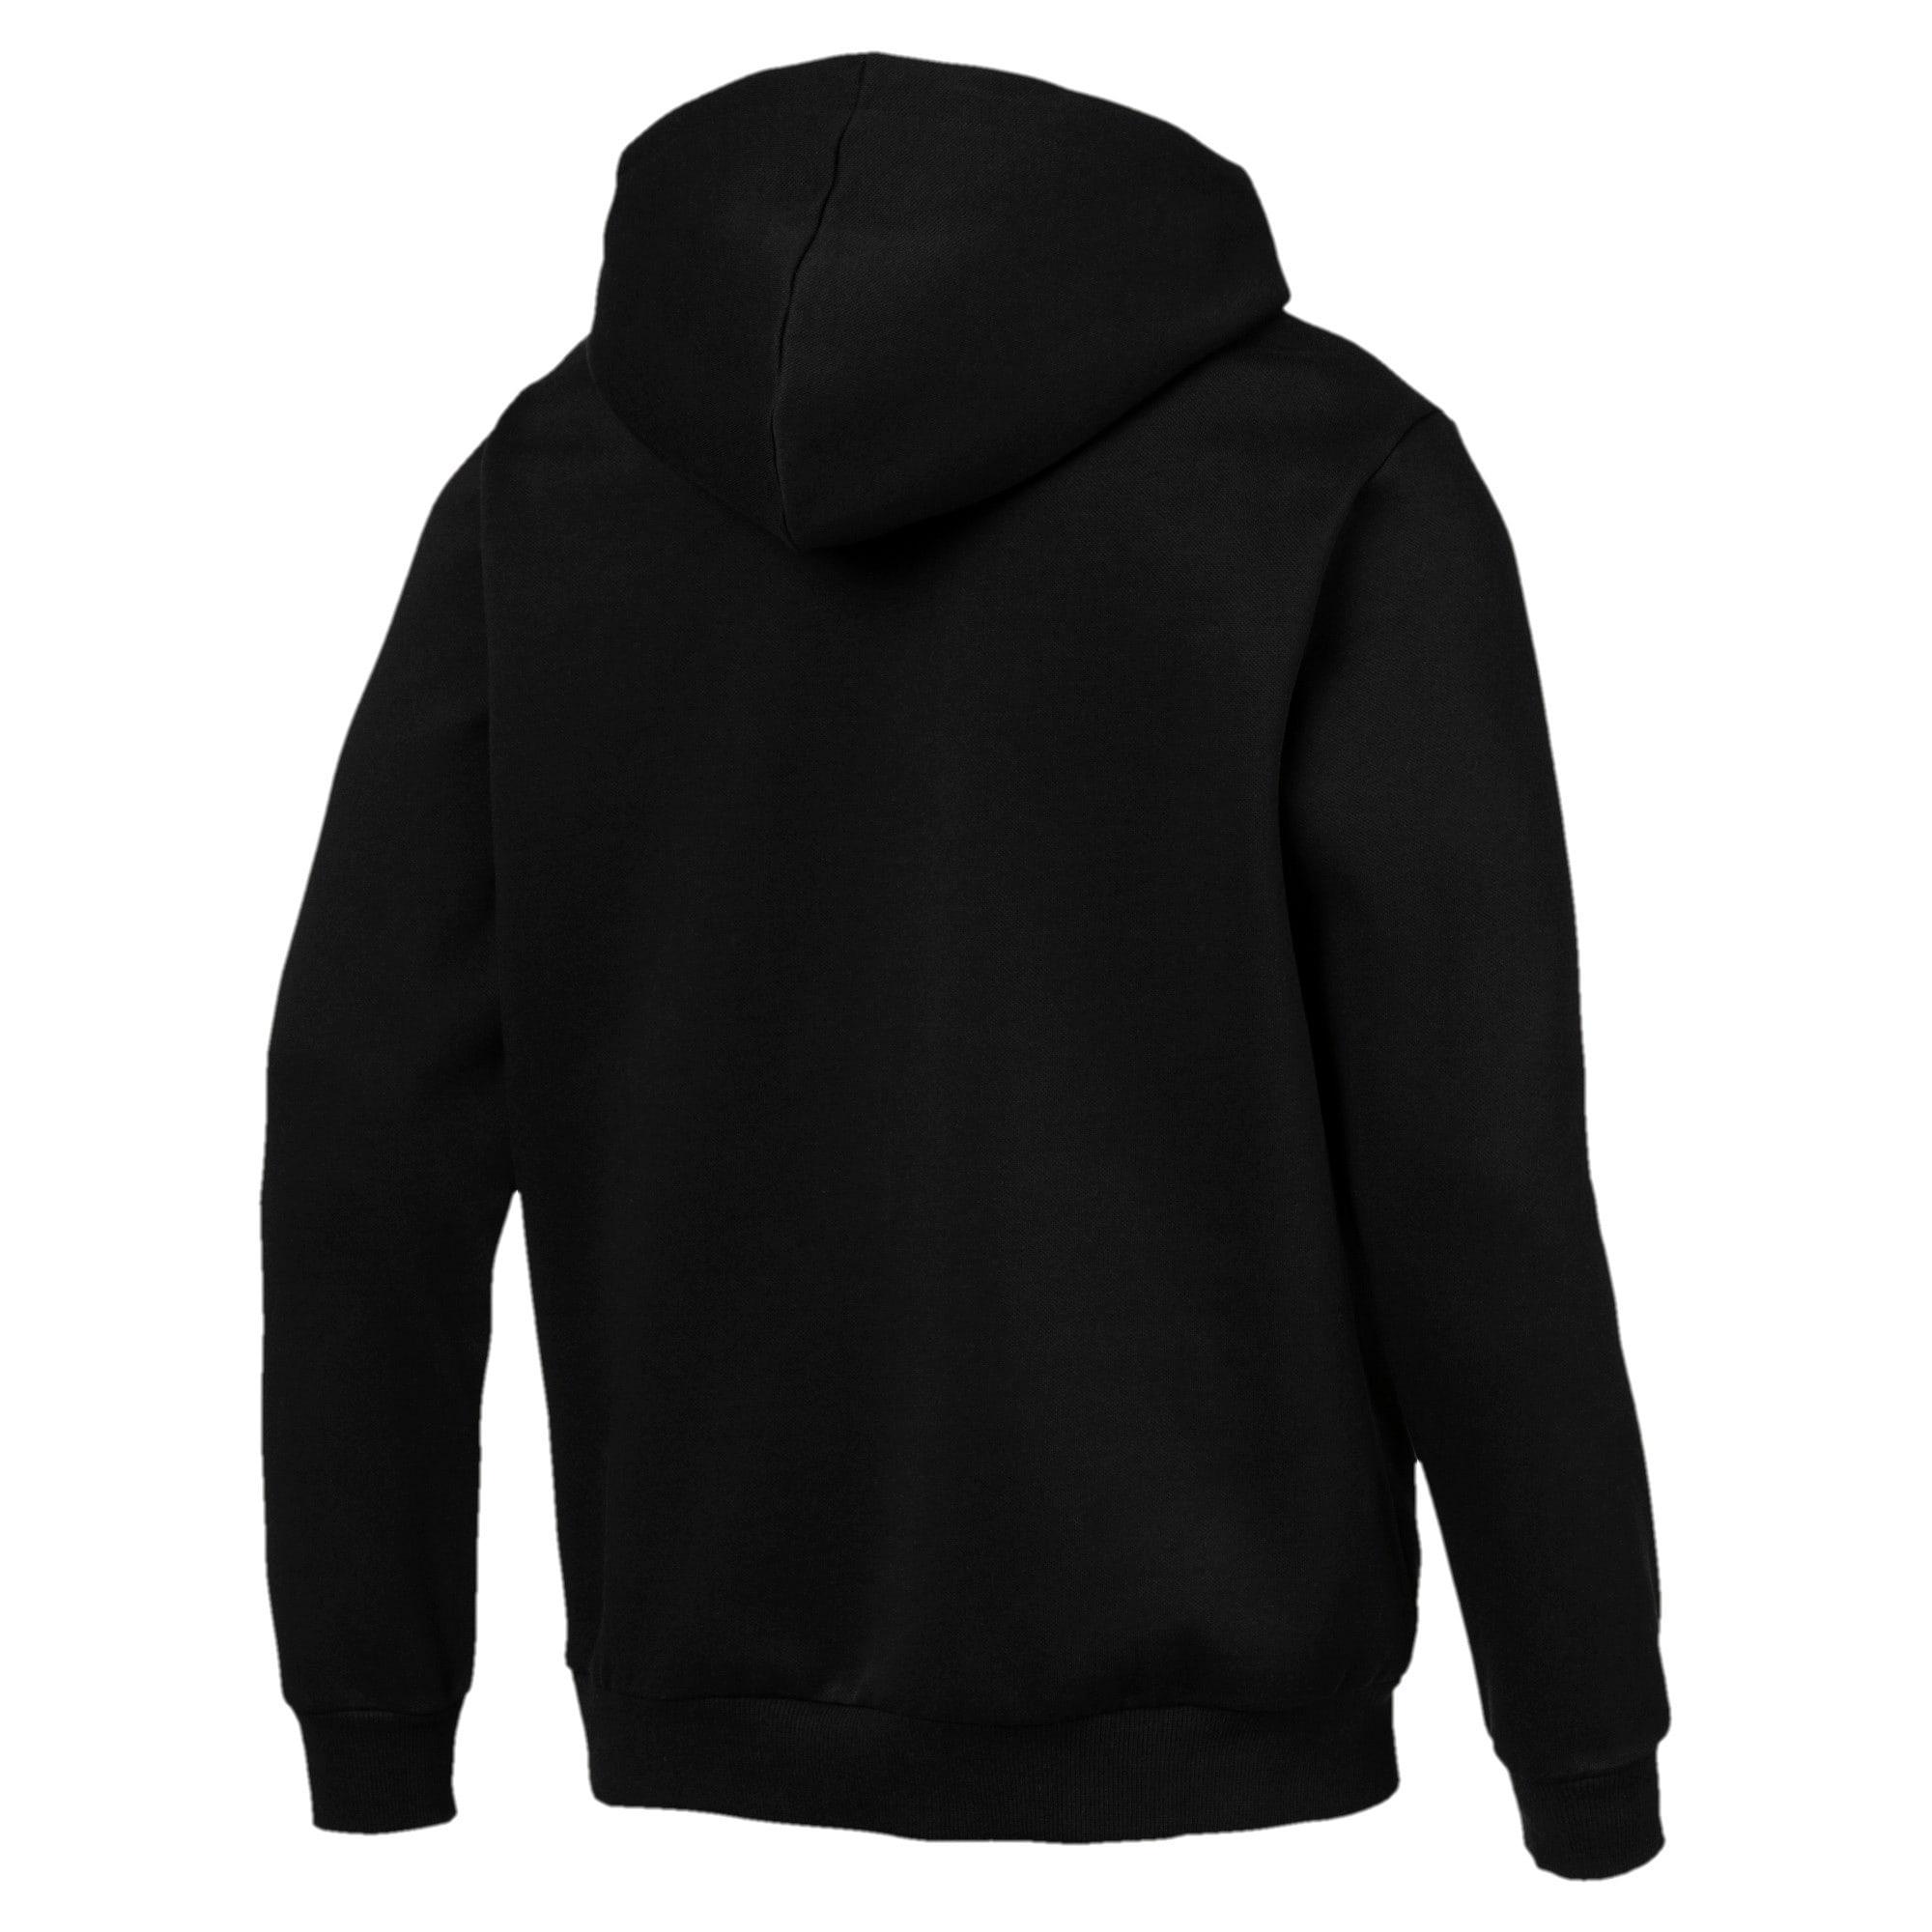 Thumbnail 5 of Essentials Men's Hooded Fleece Jacket, Puma Black, medium